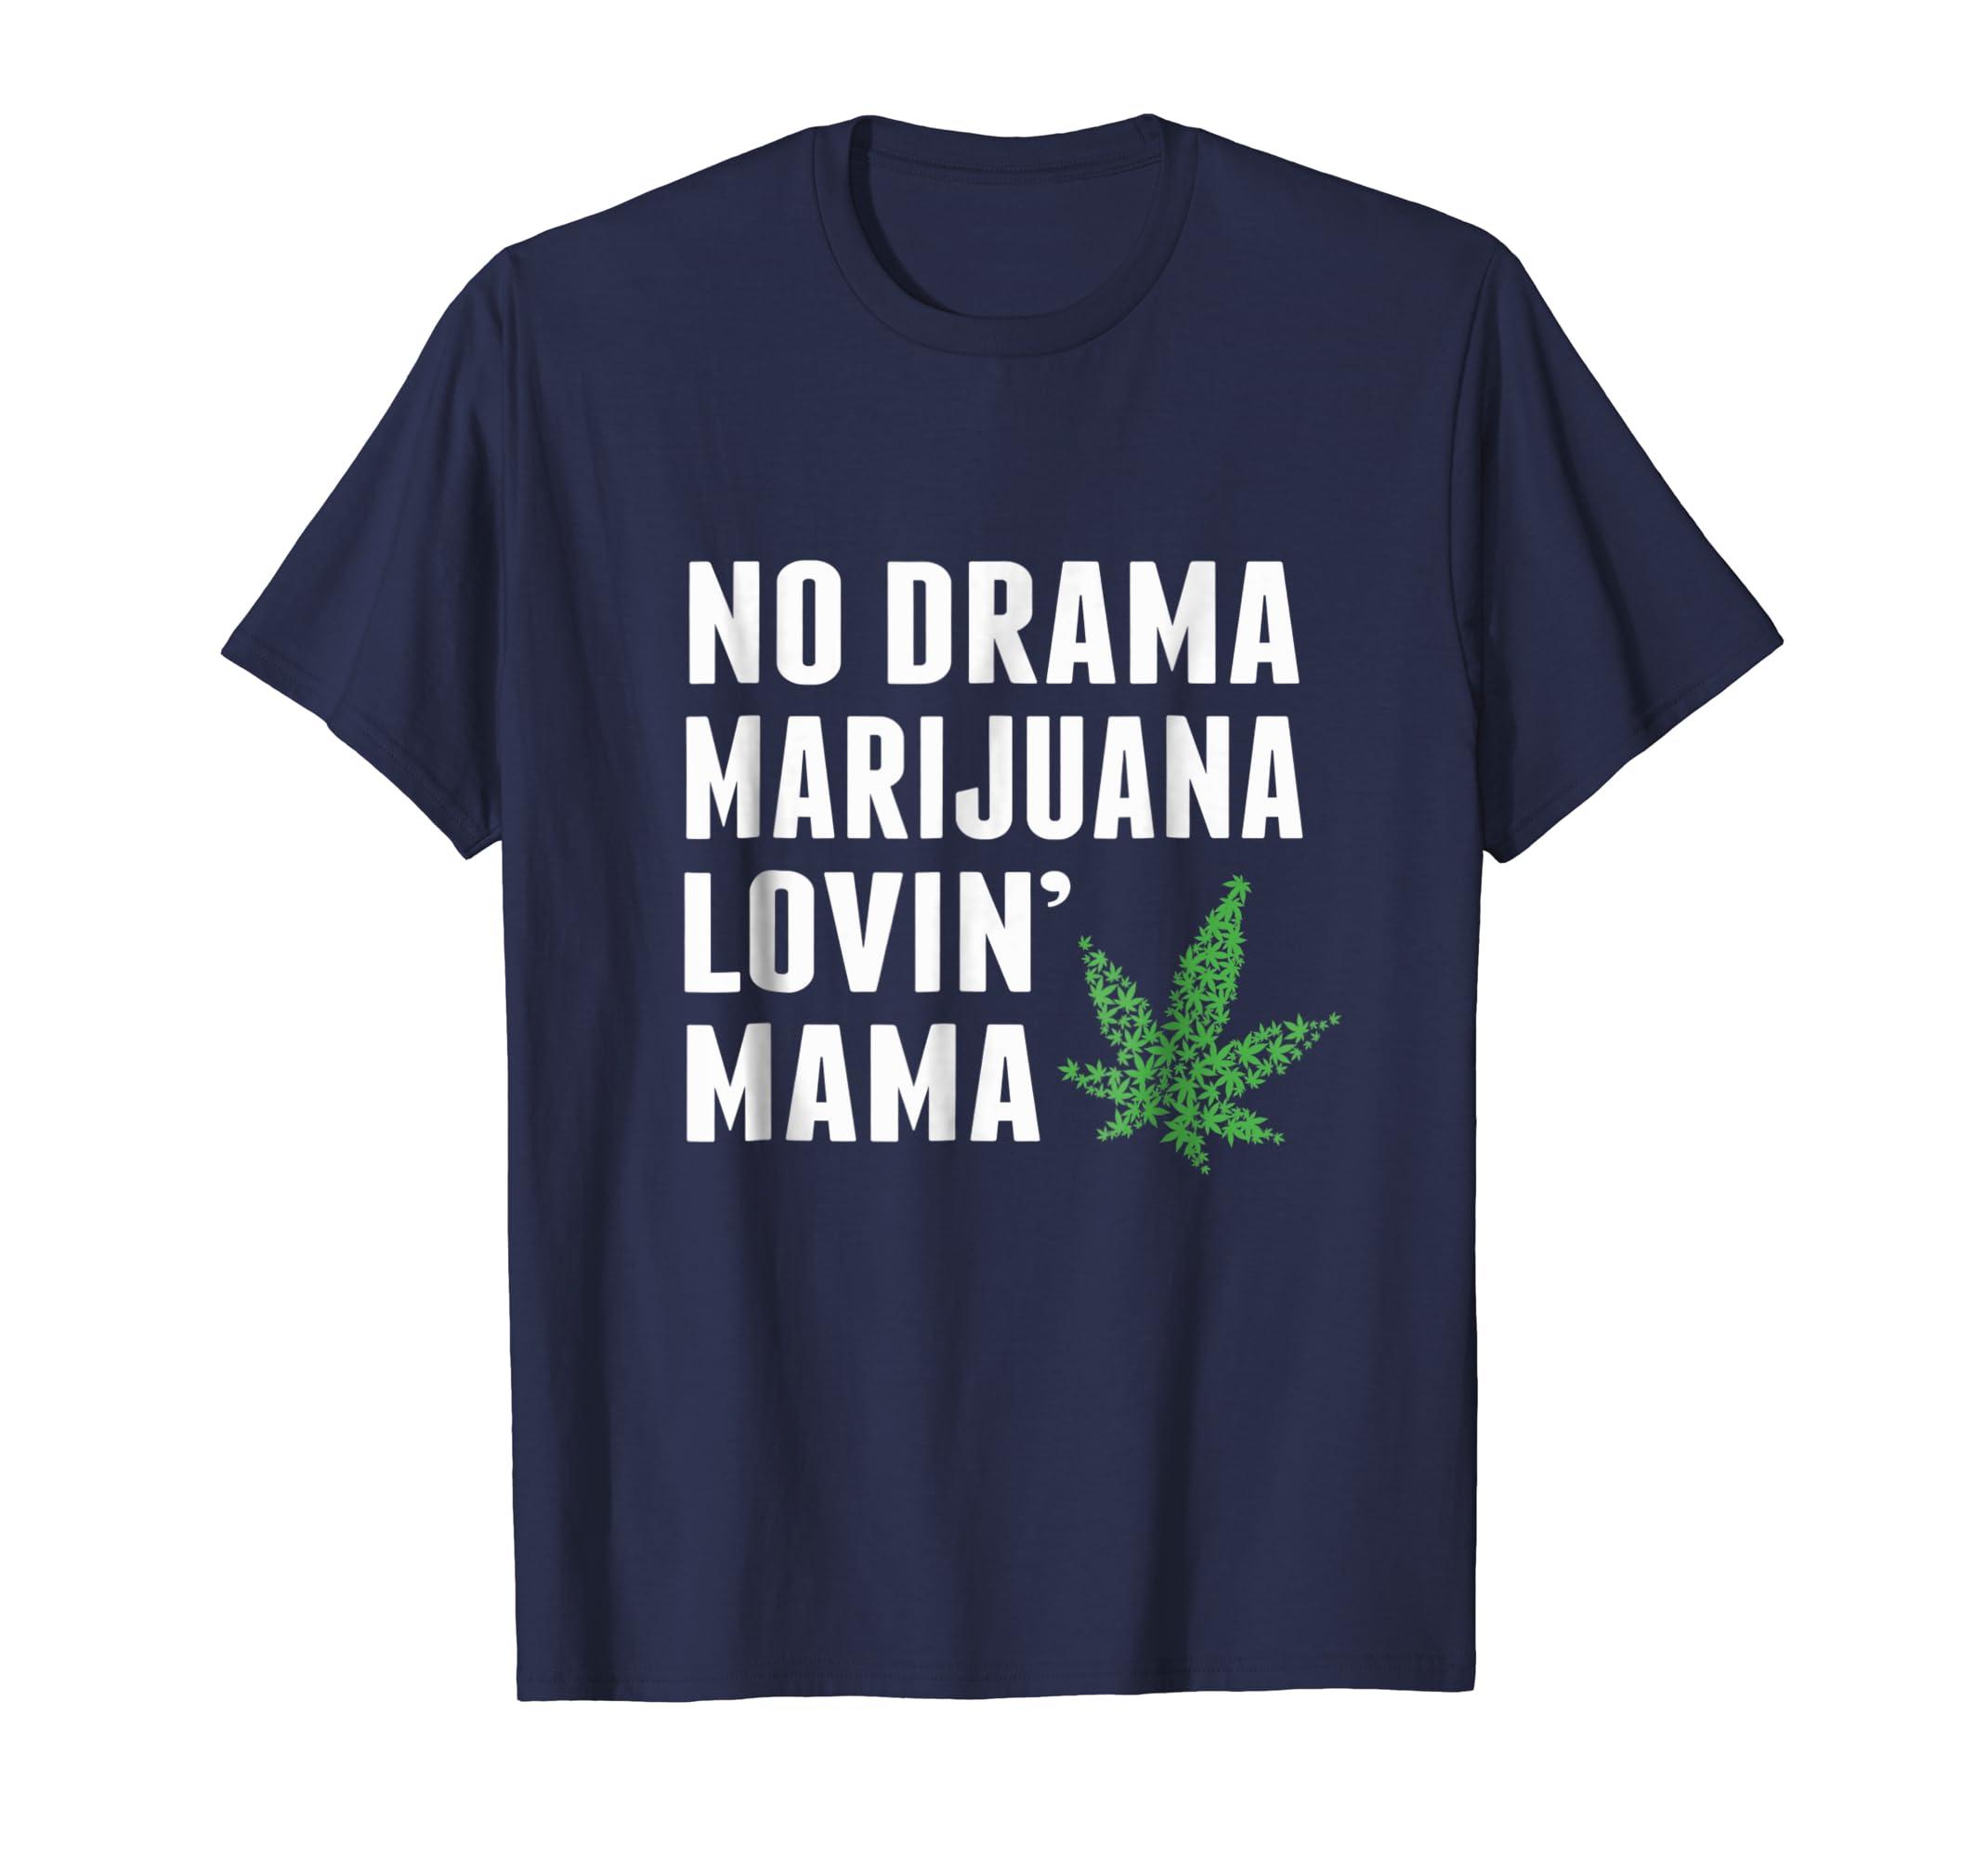 Weed Shirts for women No Drama Marijuana Funny Tshirt Gift-azvn